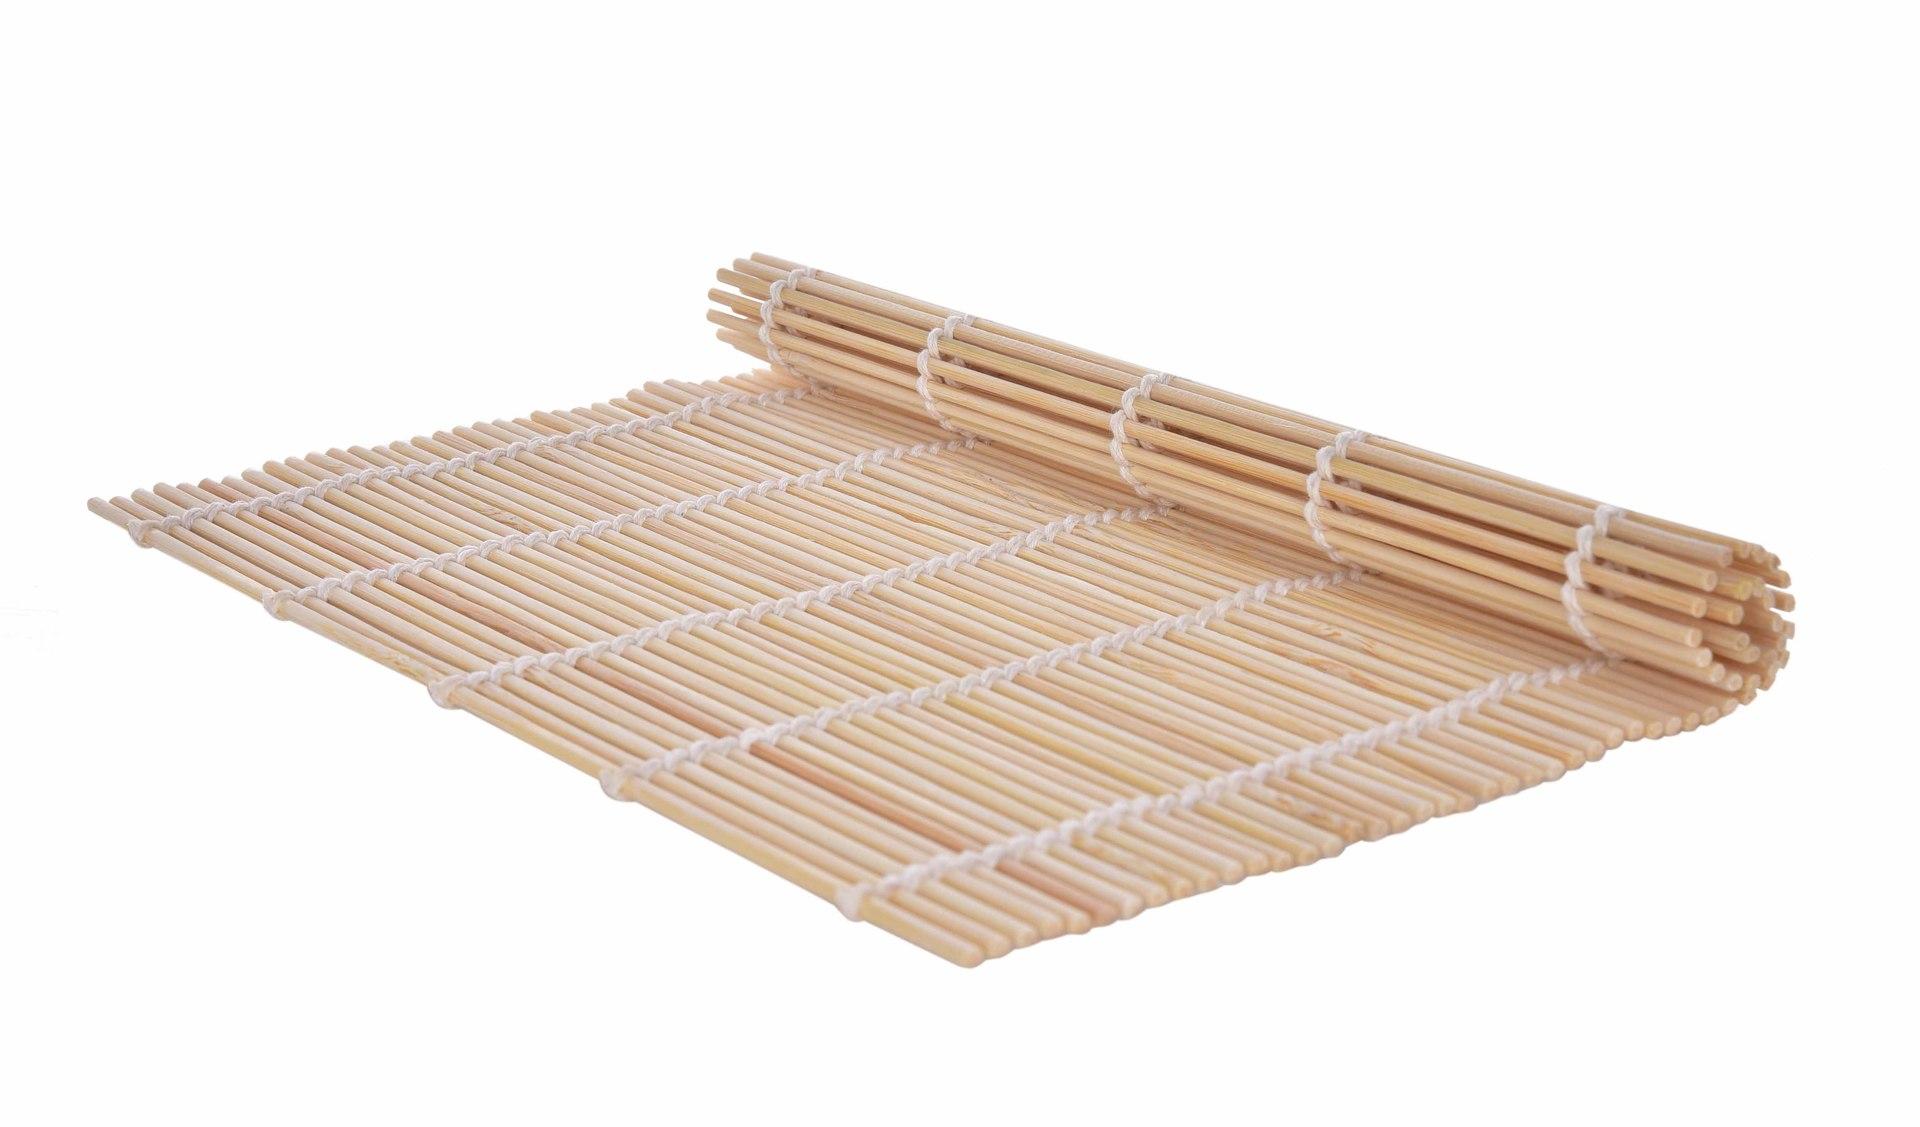 "SUSHI PODK£ADKA ""MAKISU"" do rolowania sushi, z bambusa GoEco(R)"